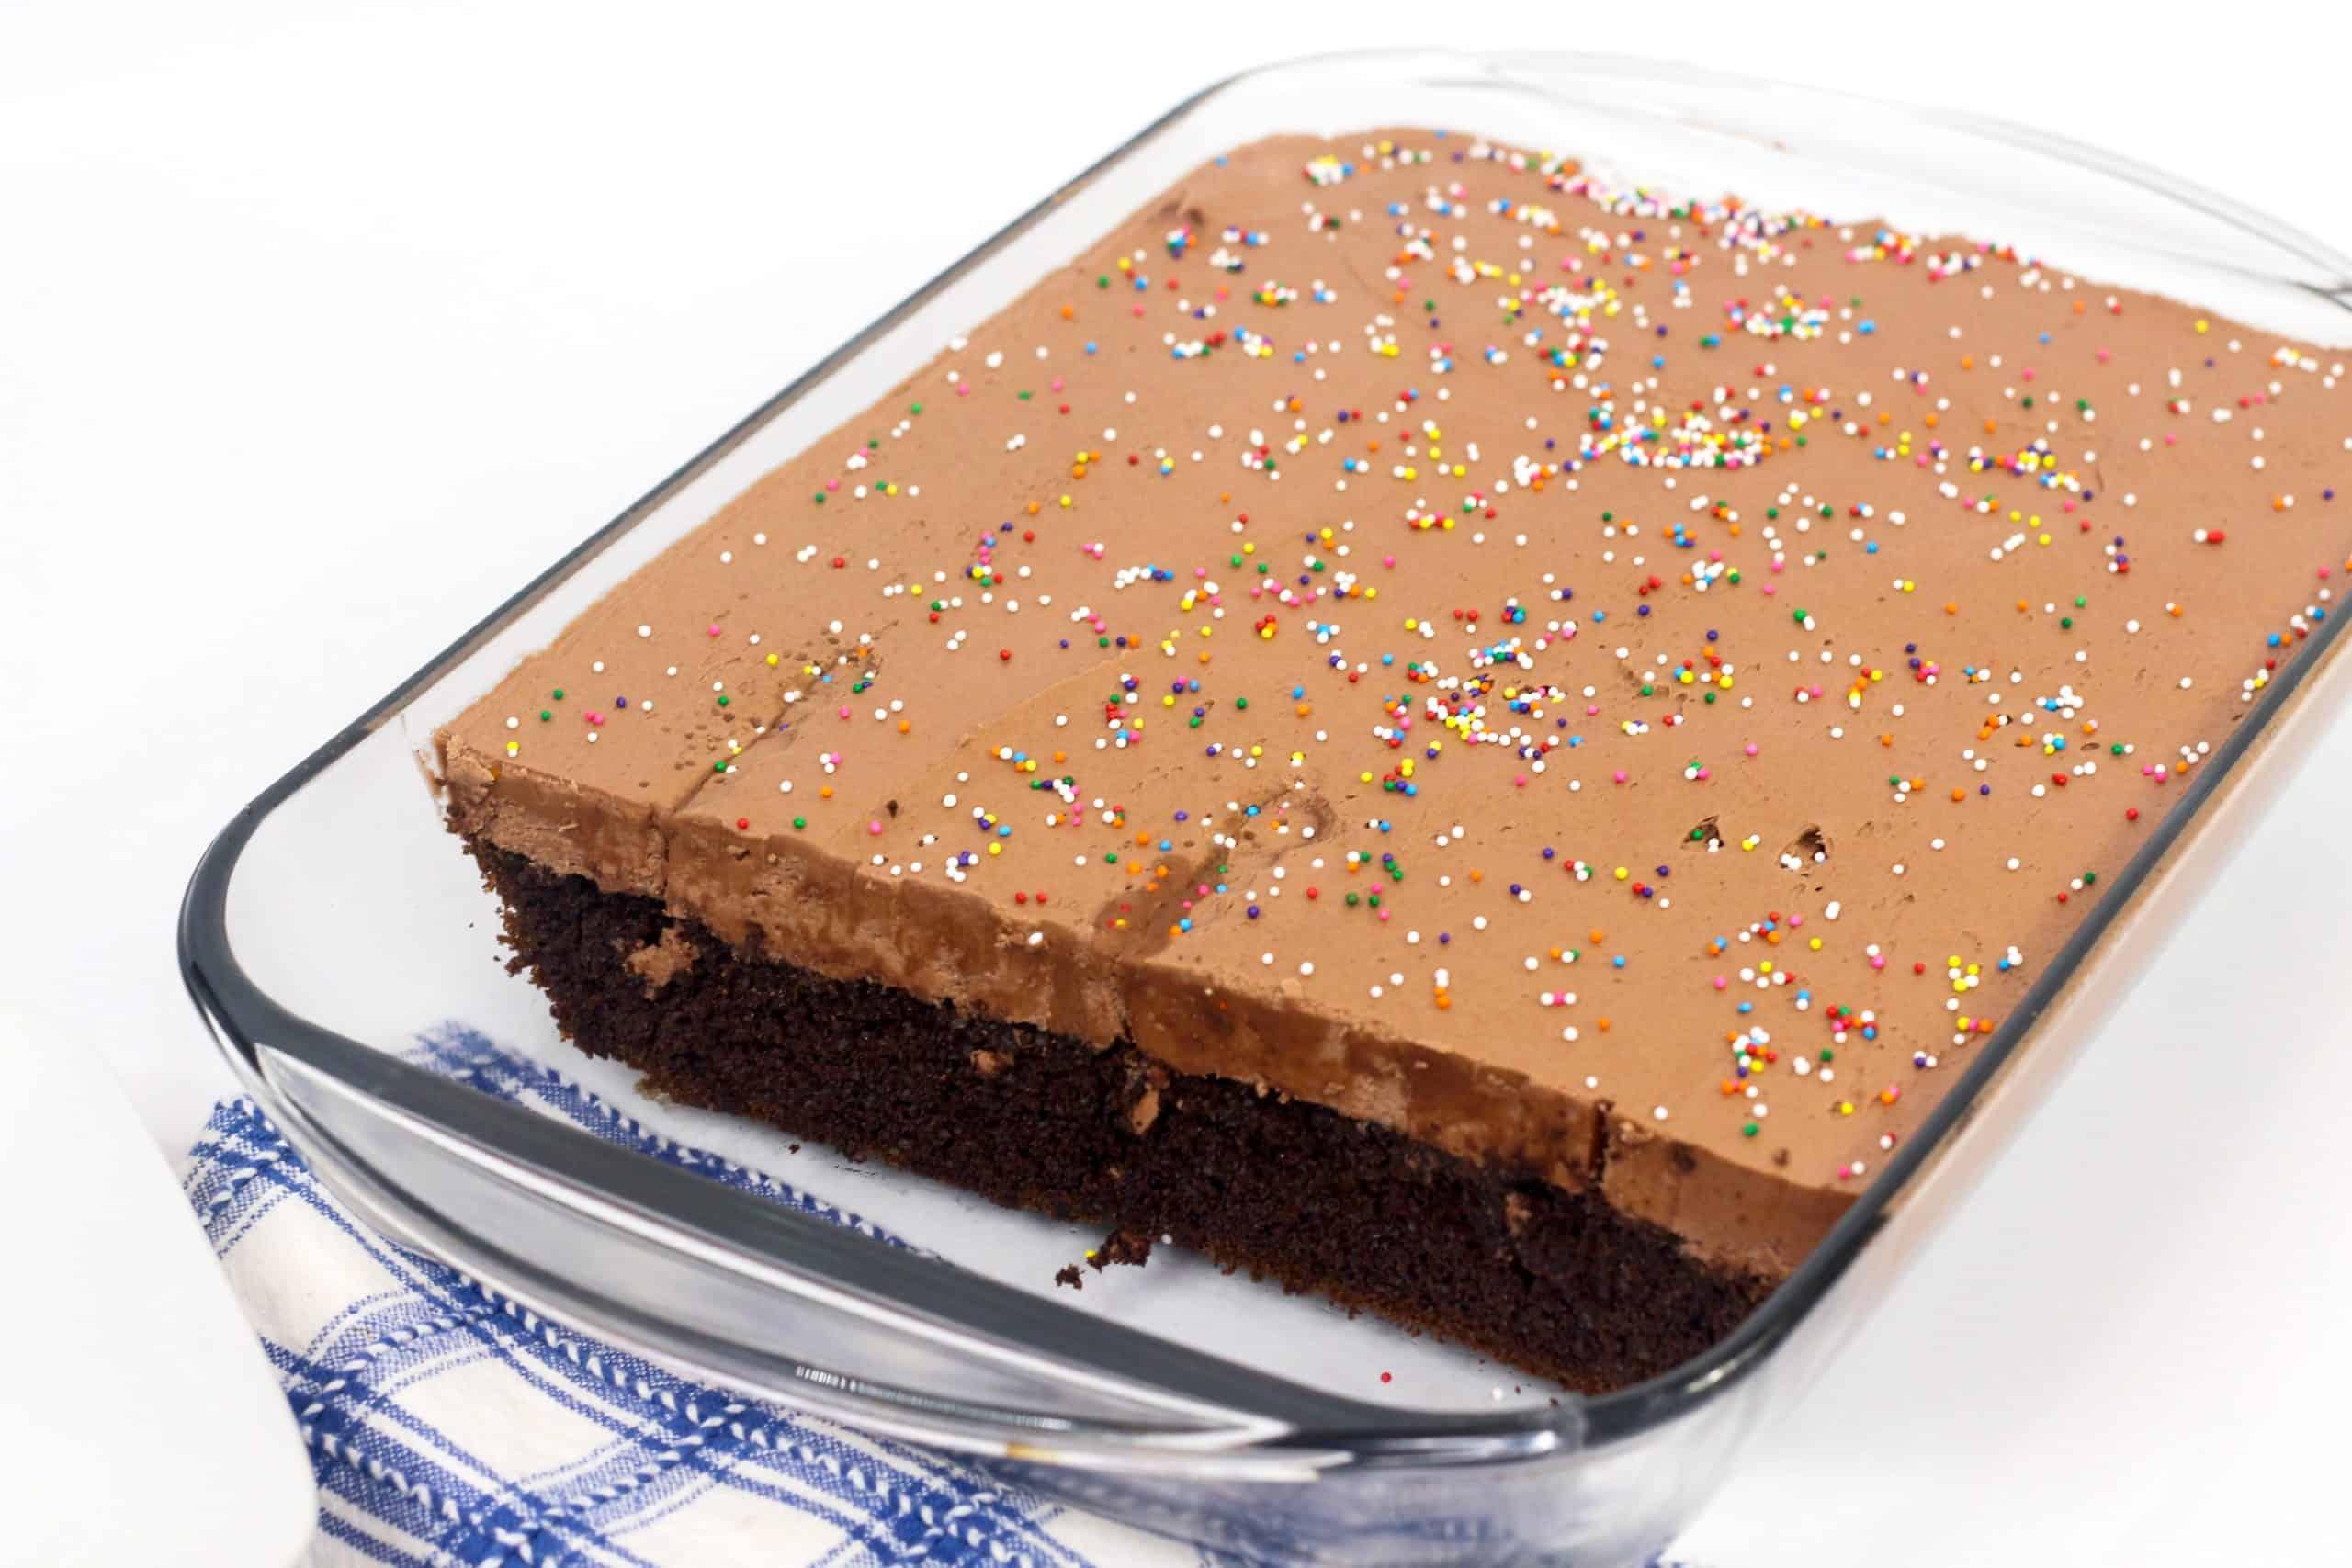 Eggless Chocolate Cake in a cake pan